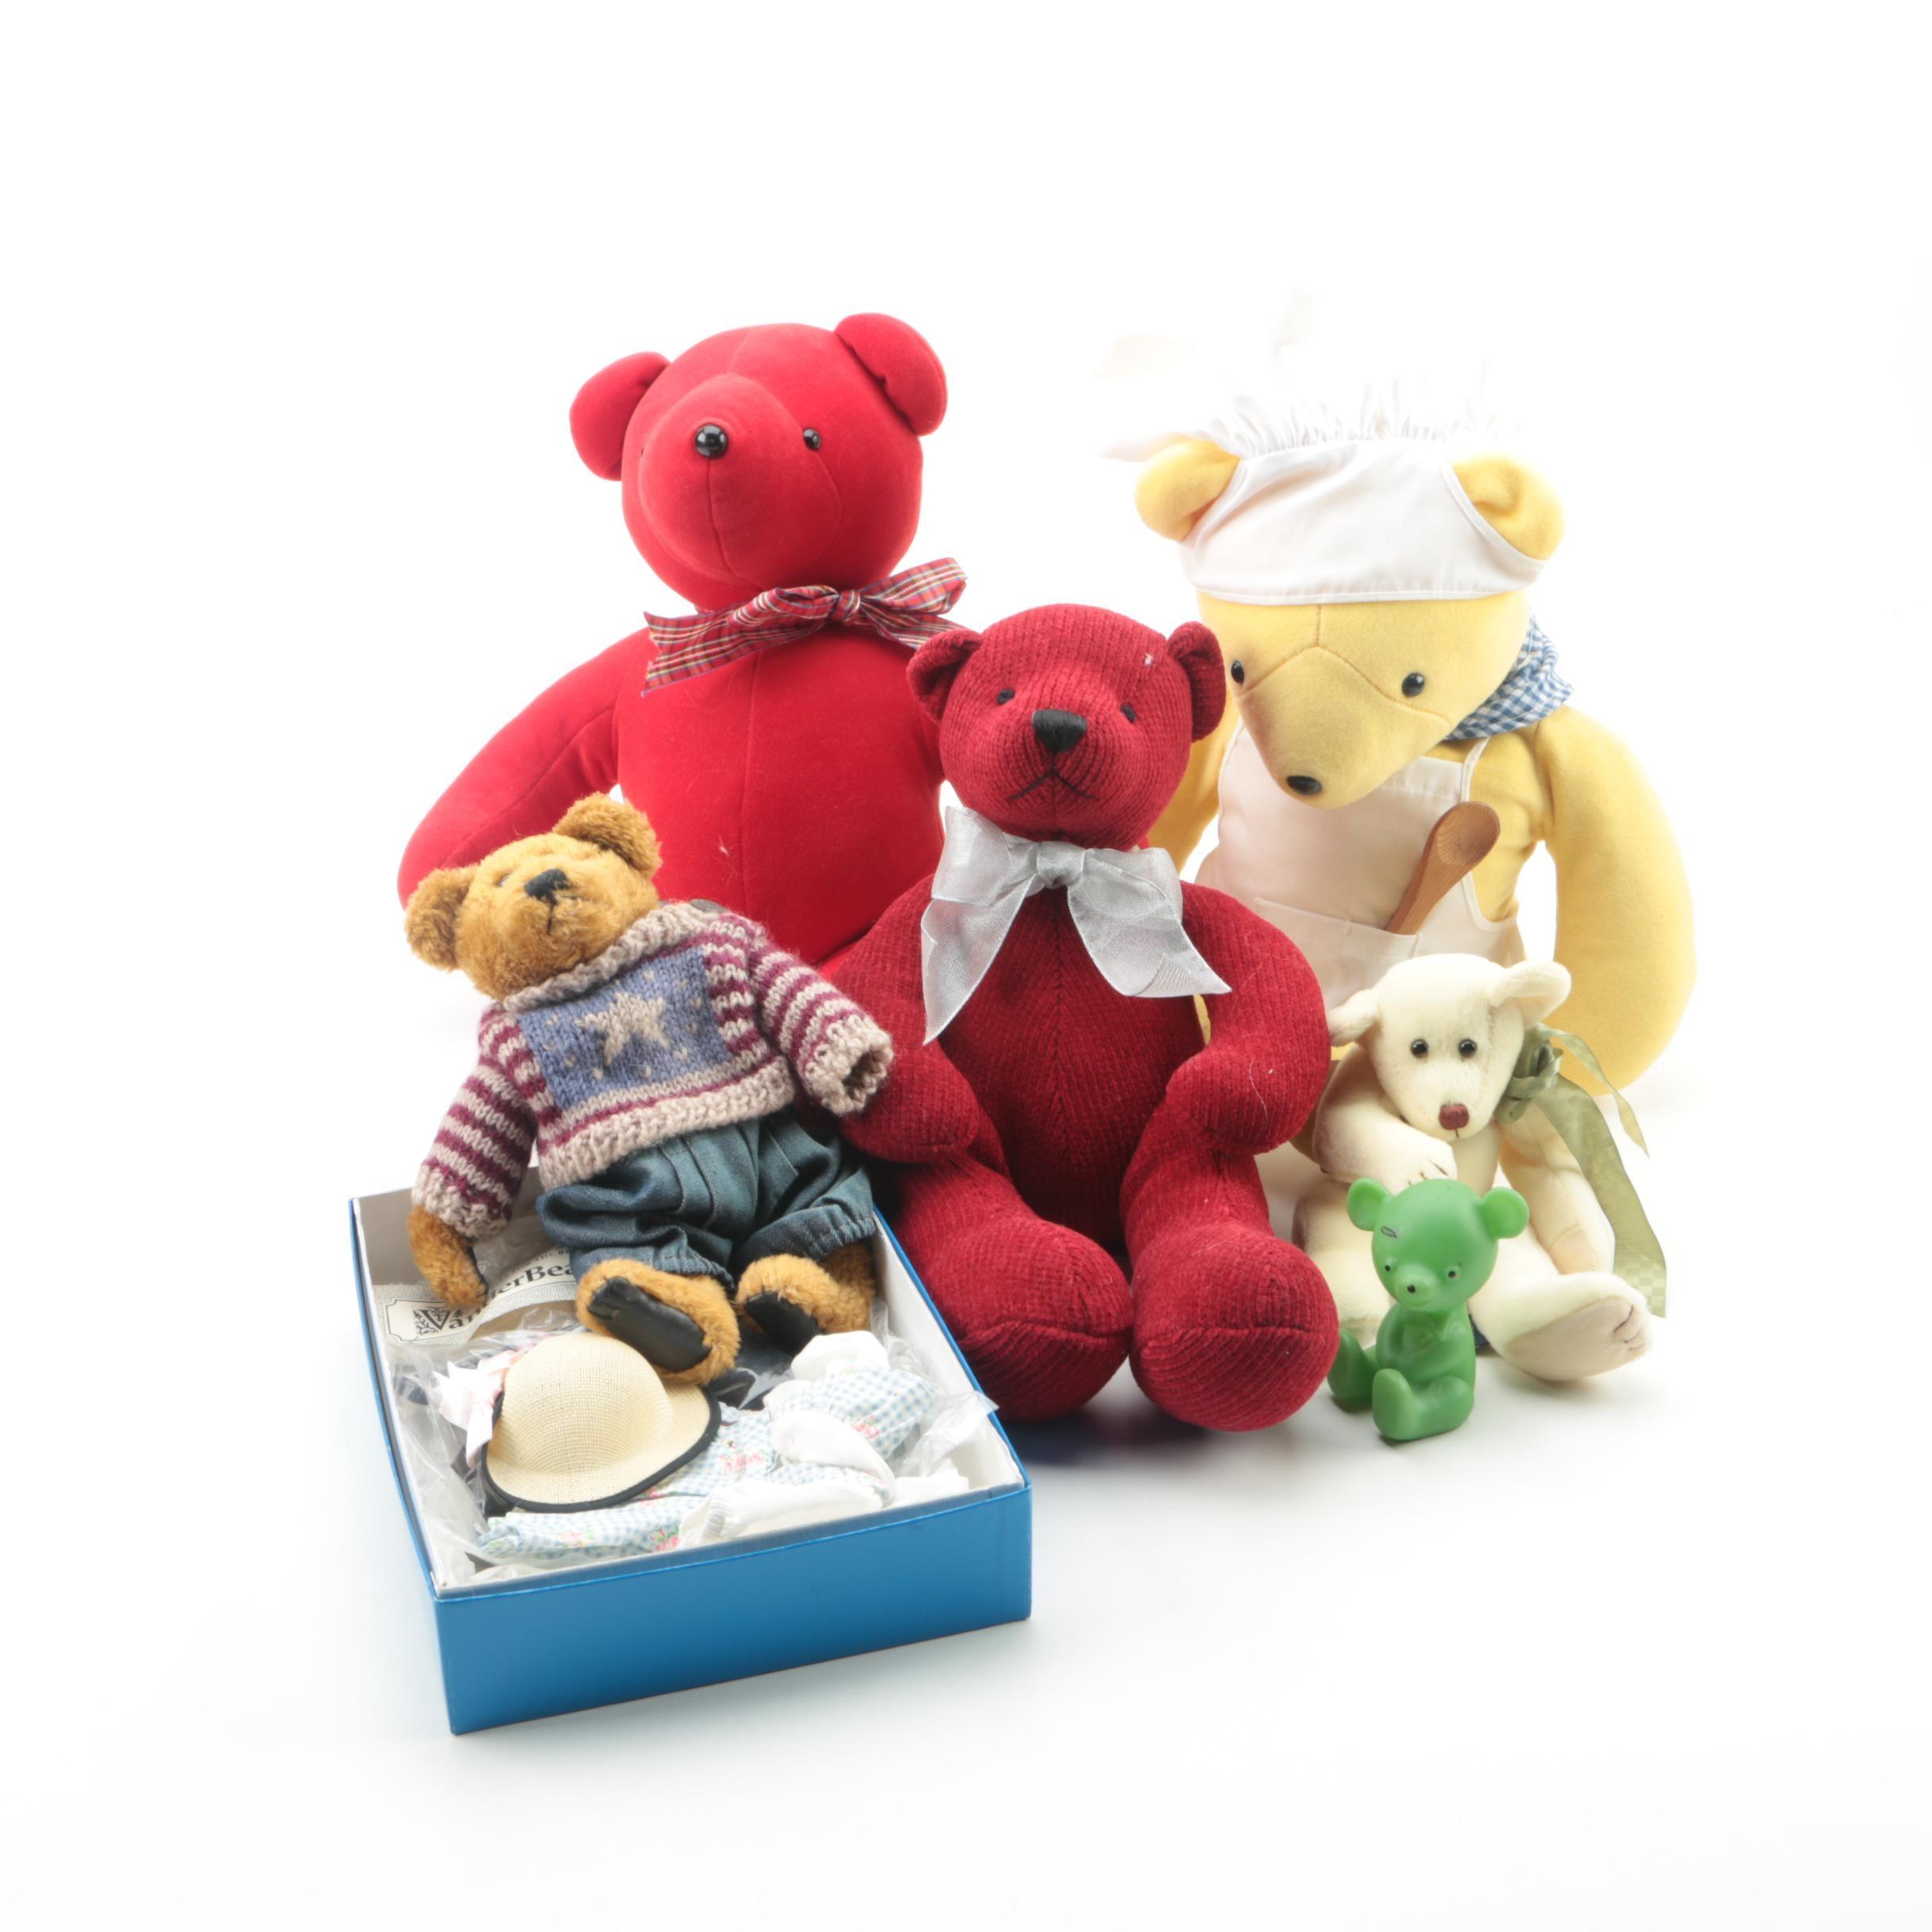 1979 North American Bear Co. Teddy Bears and Boyds Bears